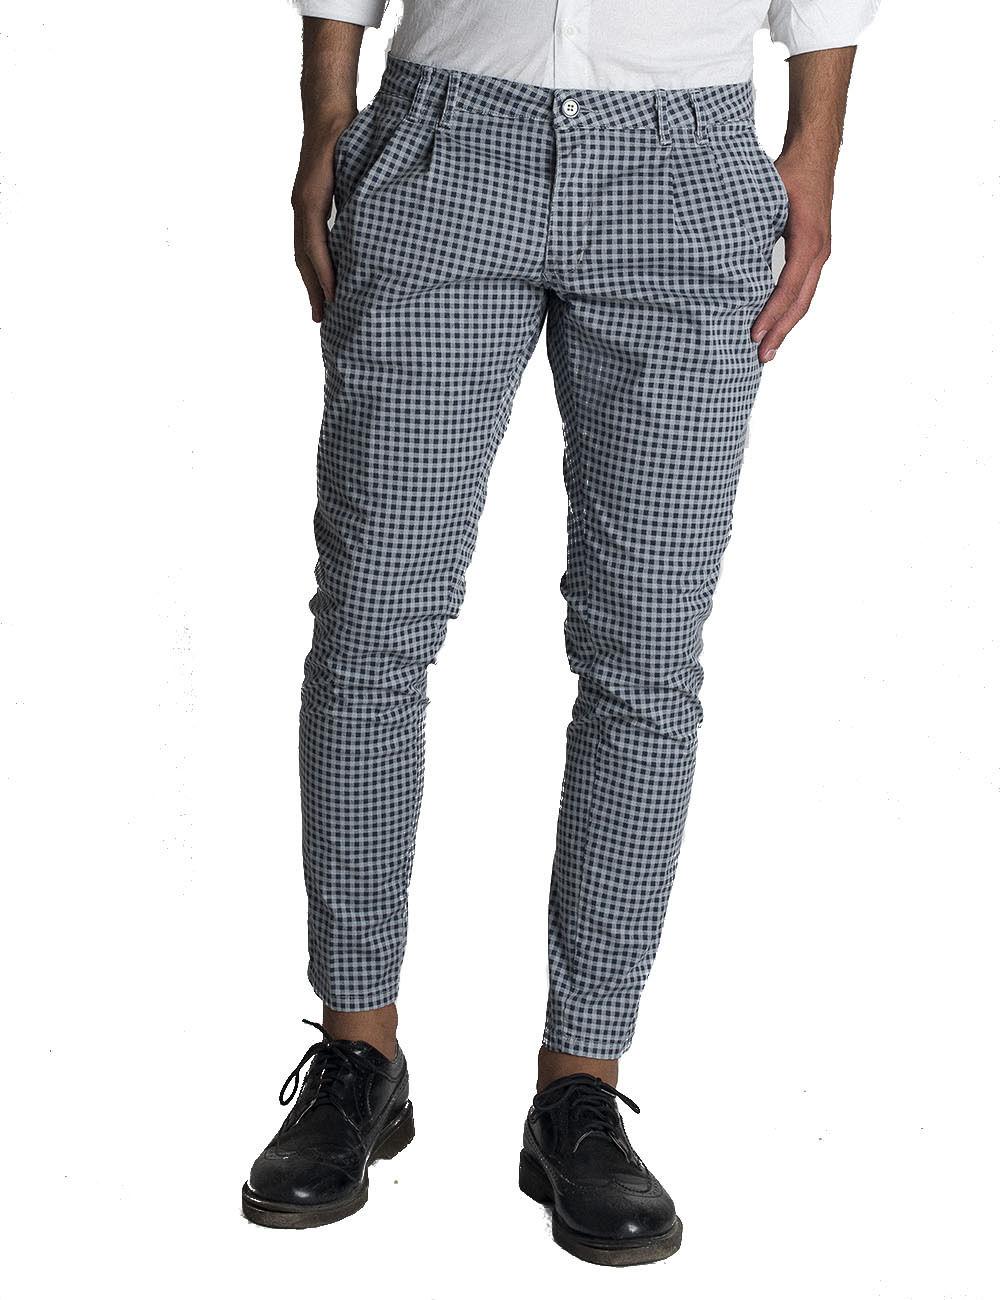 pantaloni ultima moda uomo